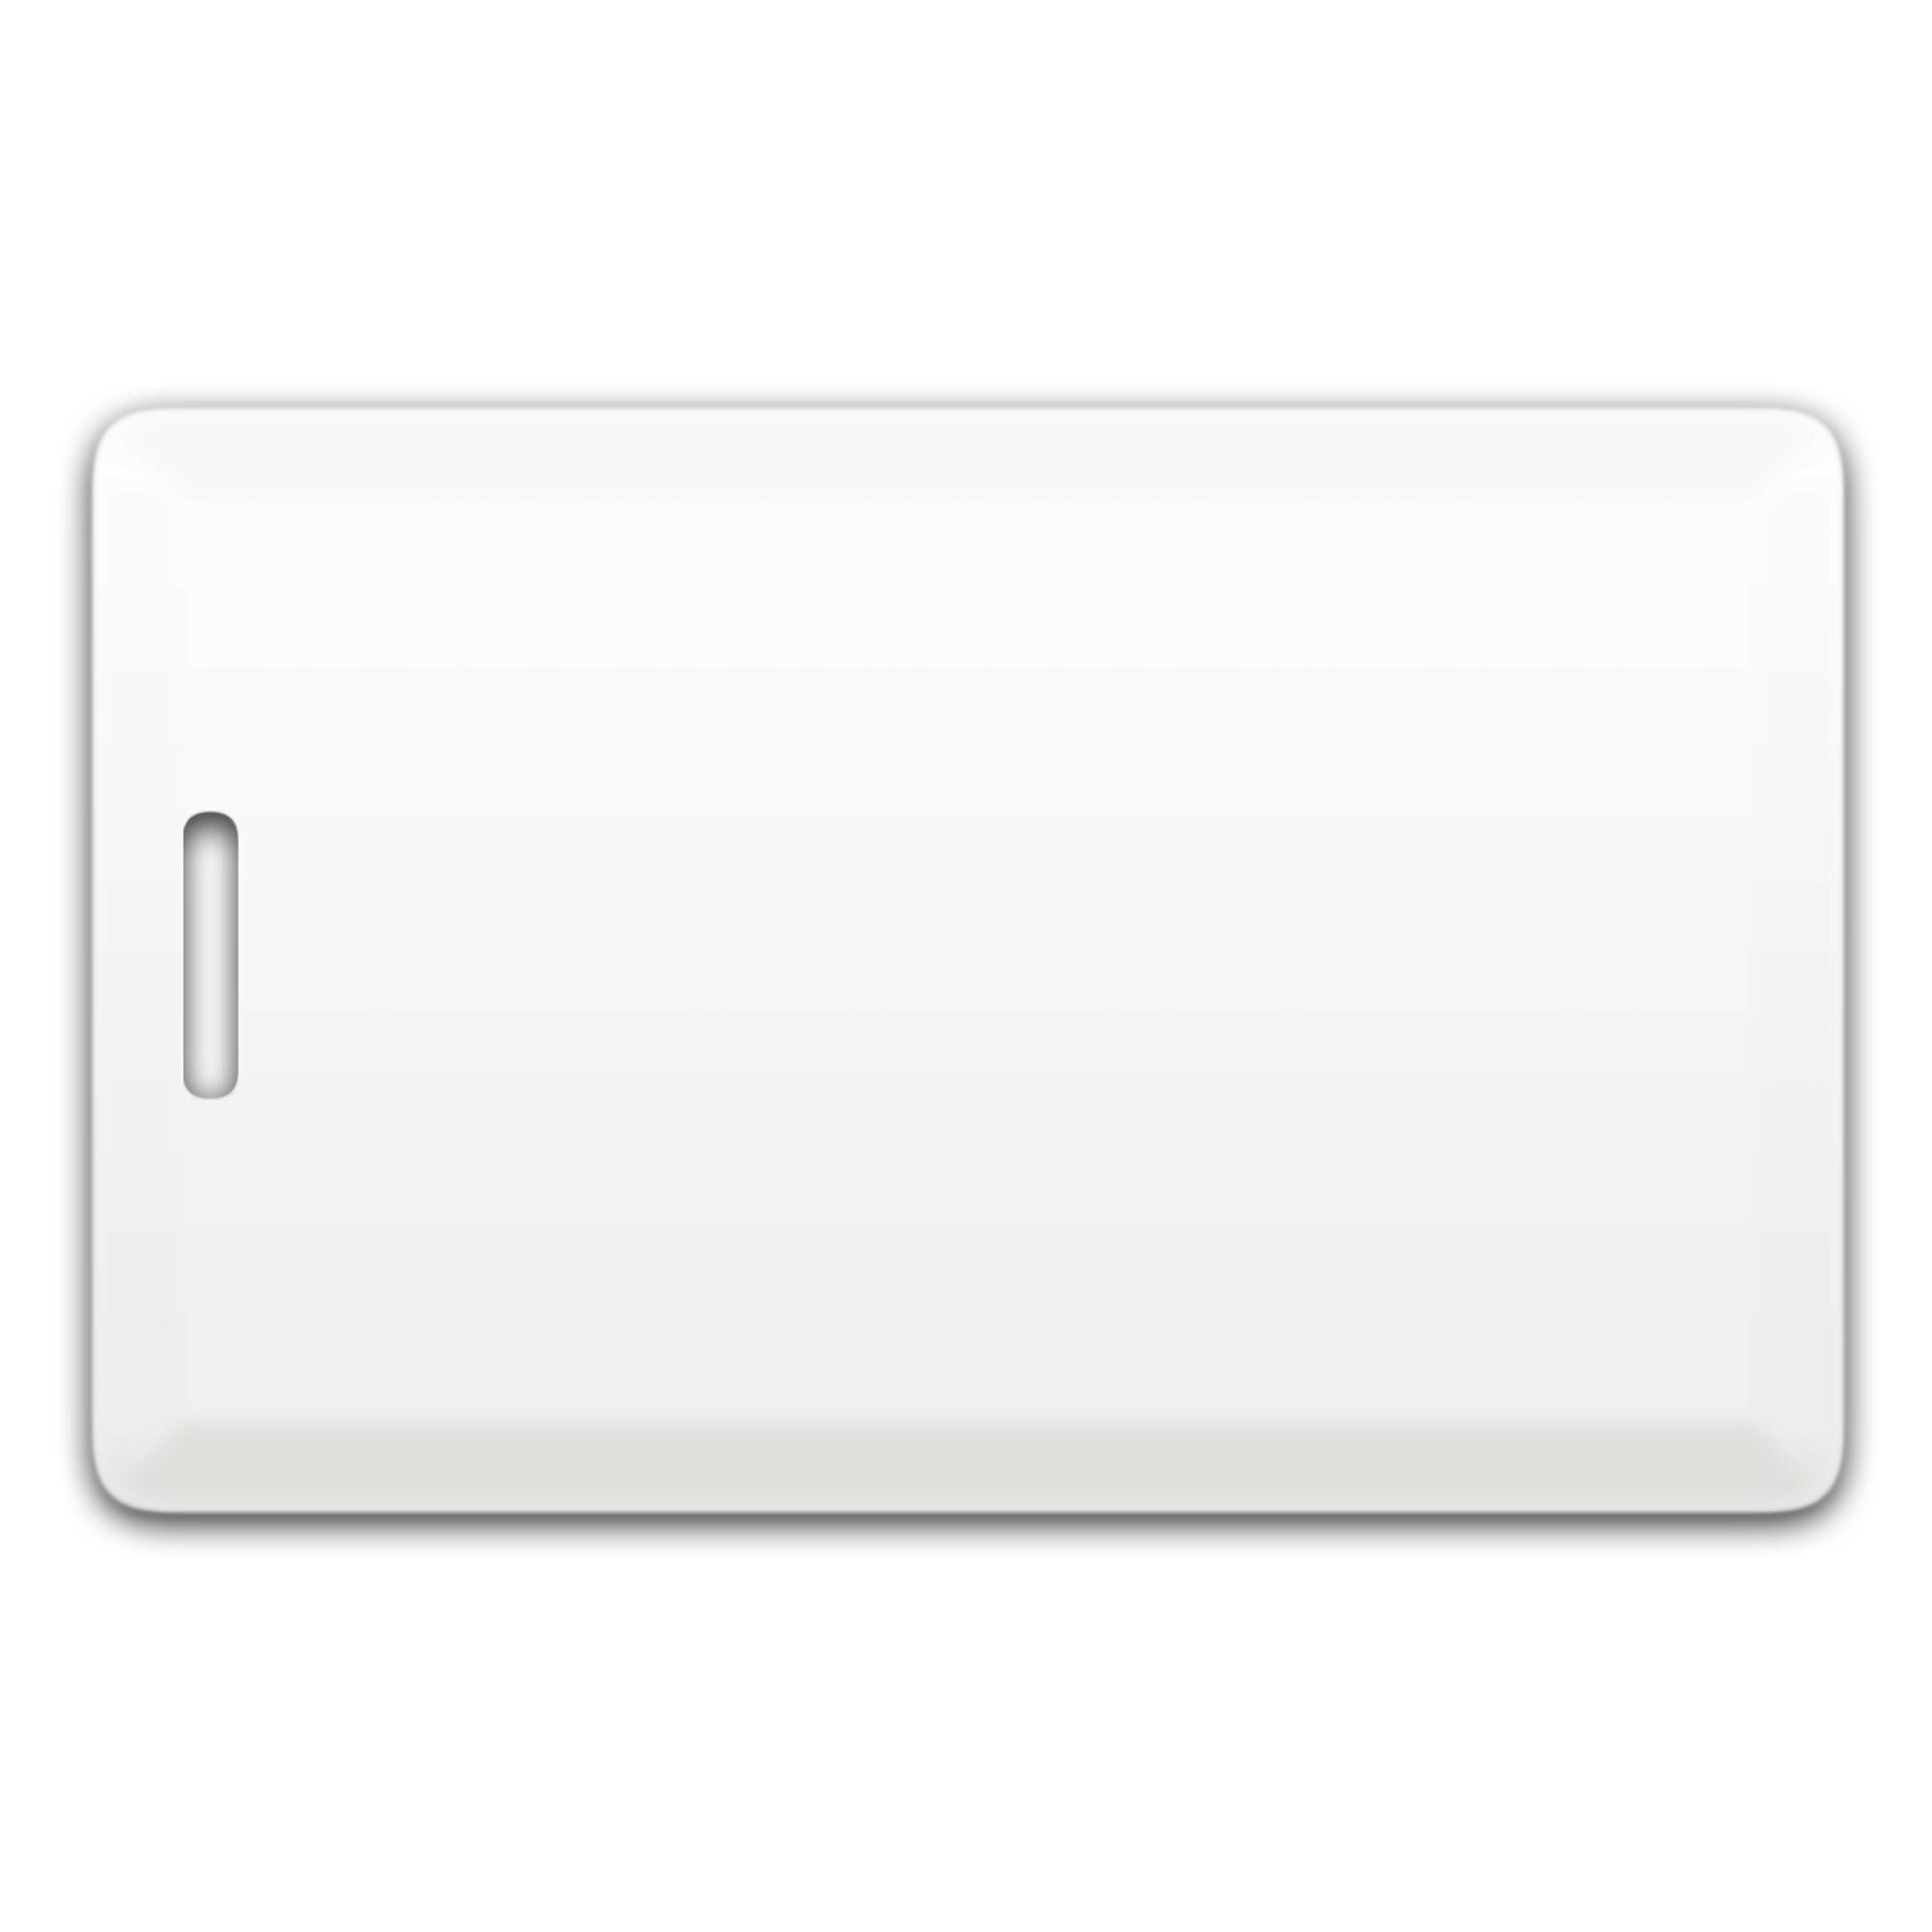 Безконтактна пластикова карта HID ProxCard 2 Clamshell з прорізом